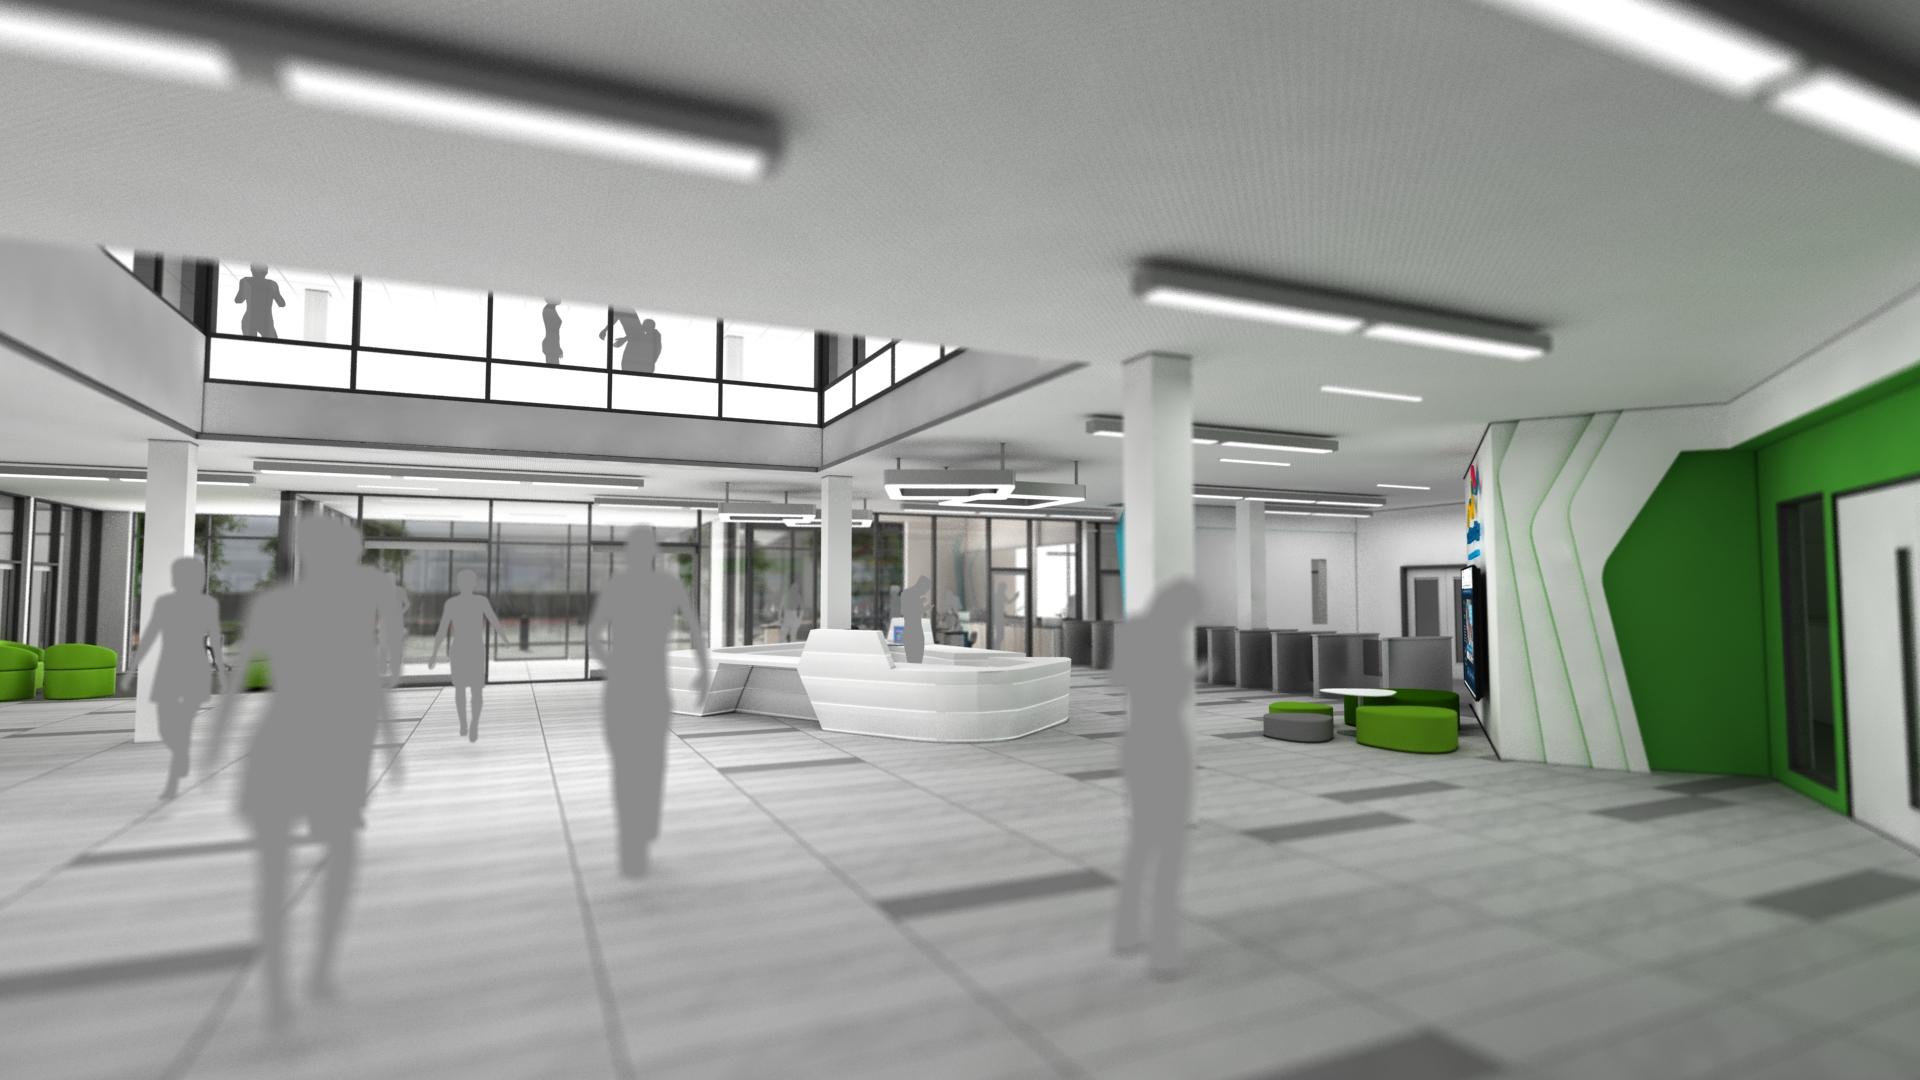 South Essex College Architectural 3D Render-17.jpg